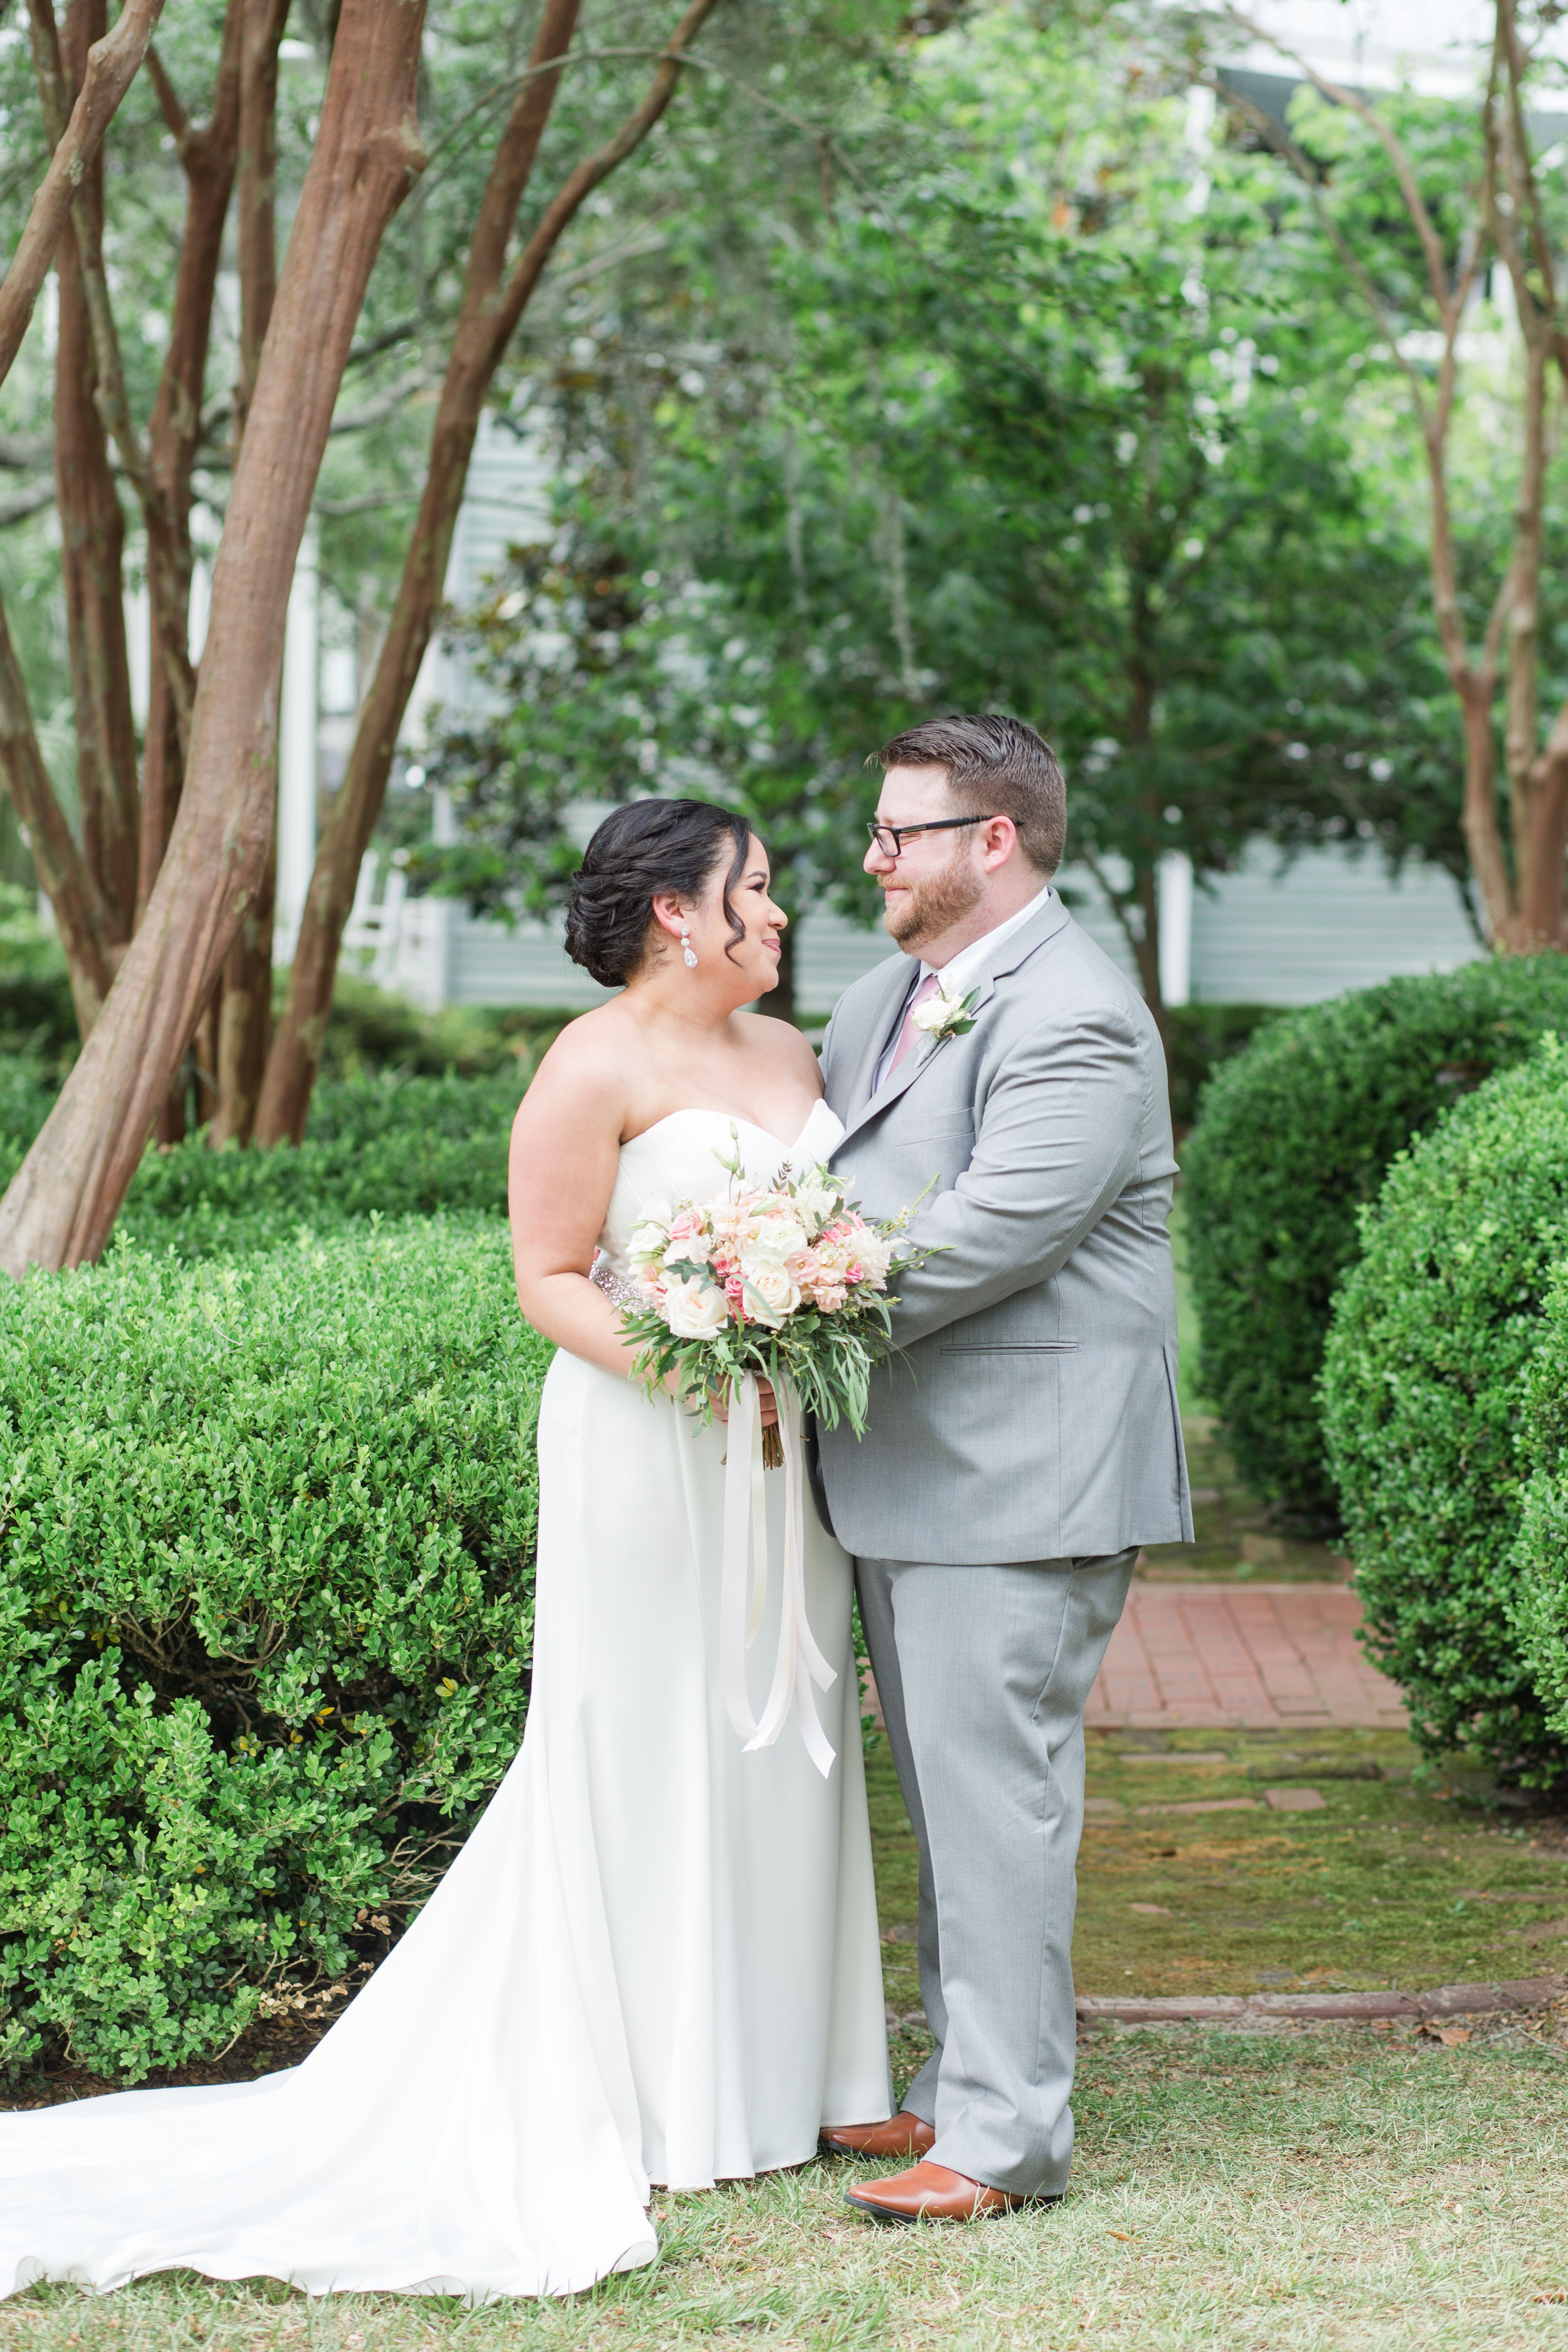 Mauve Wedding l Amber Brogdon Photography l Tallahassee Garden Club Wedding Venue l Mauve Navy Gold